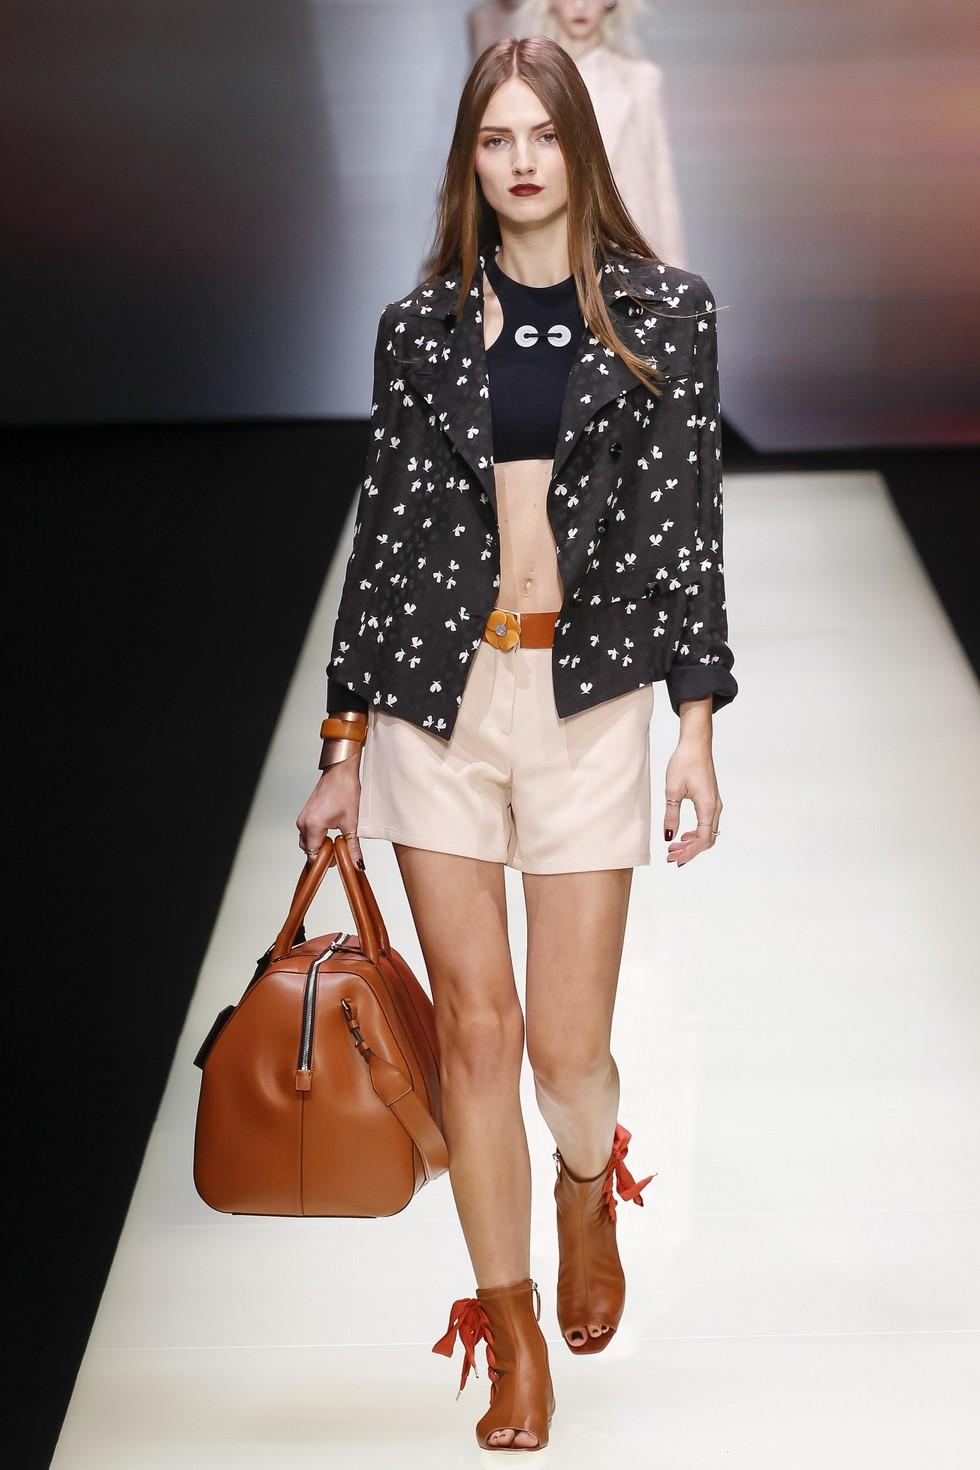 Milan Fashion Week 2016 Spring Summer News Day three best moments-Emporio Armani